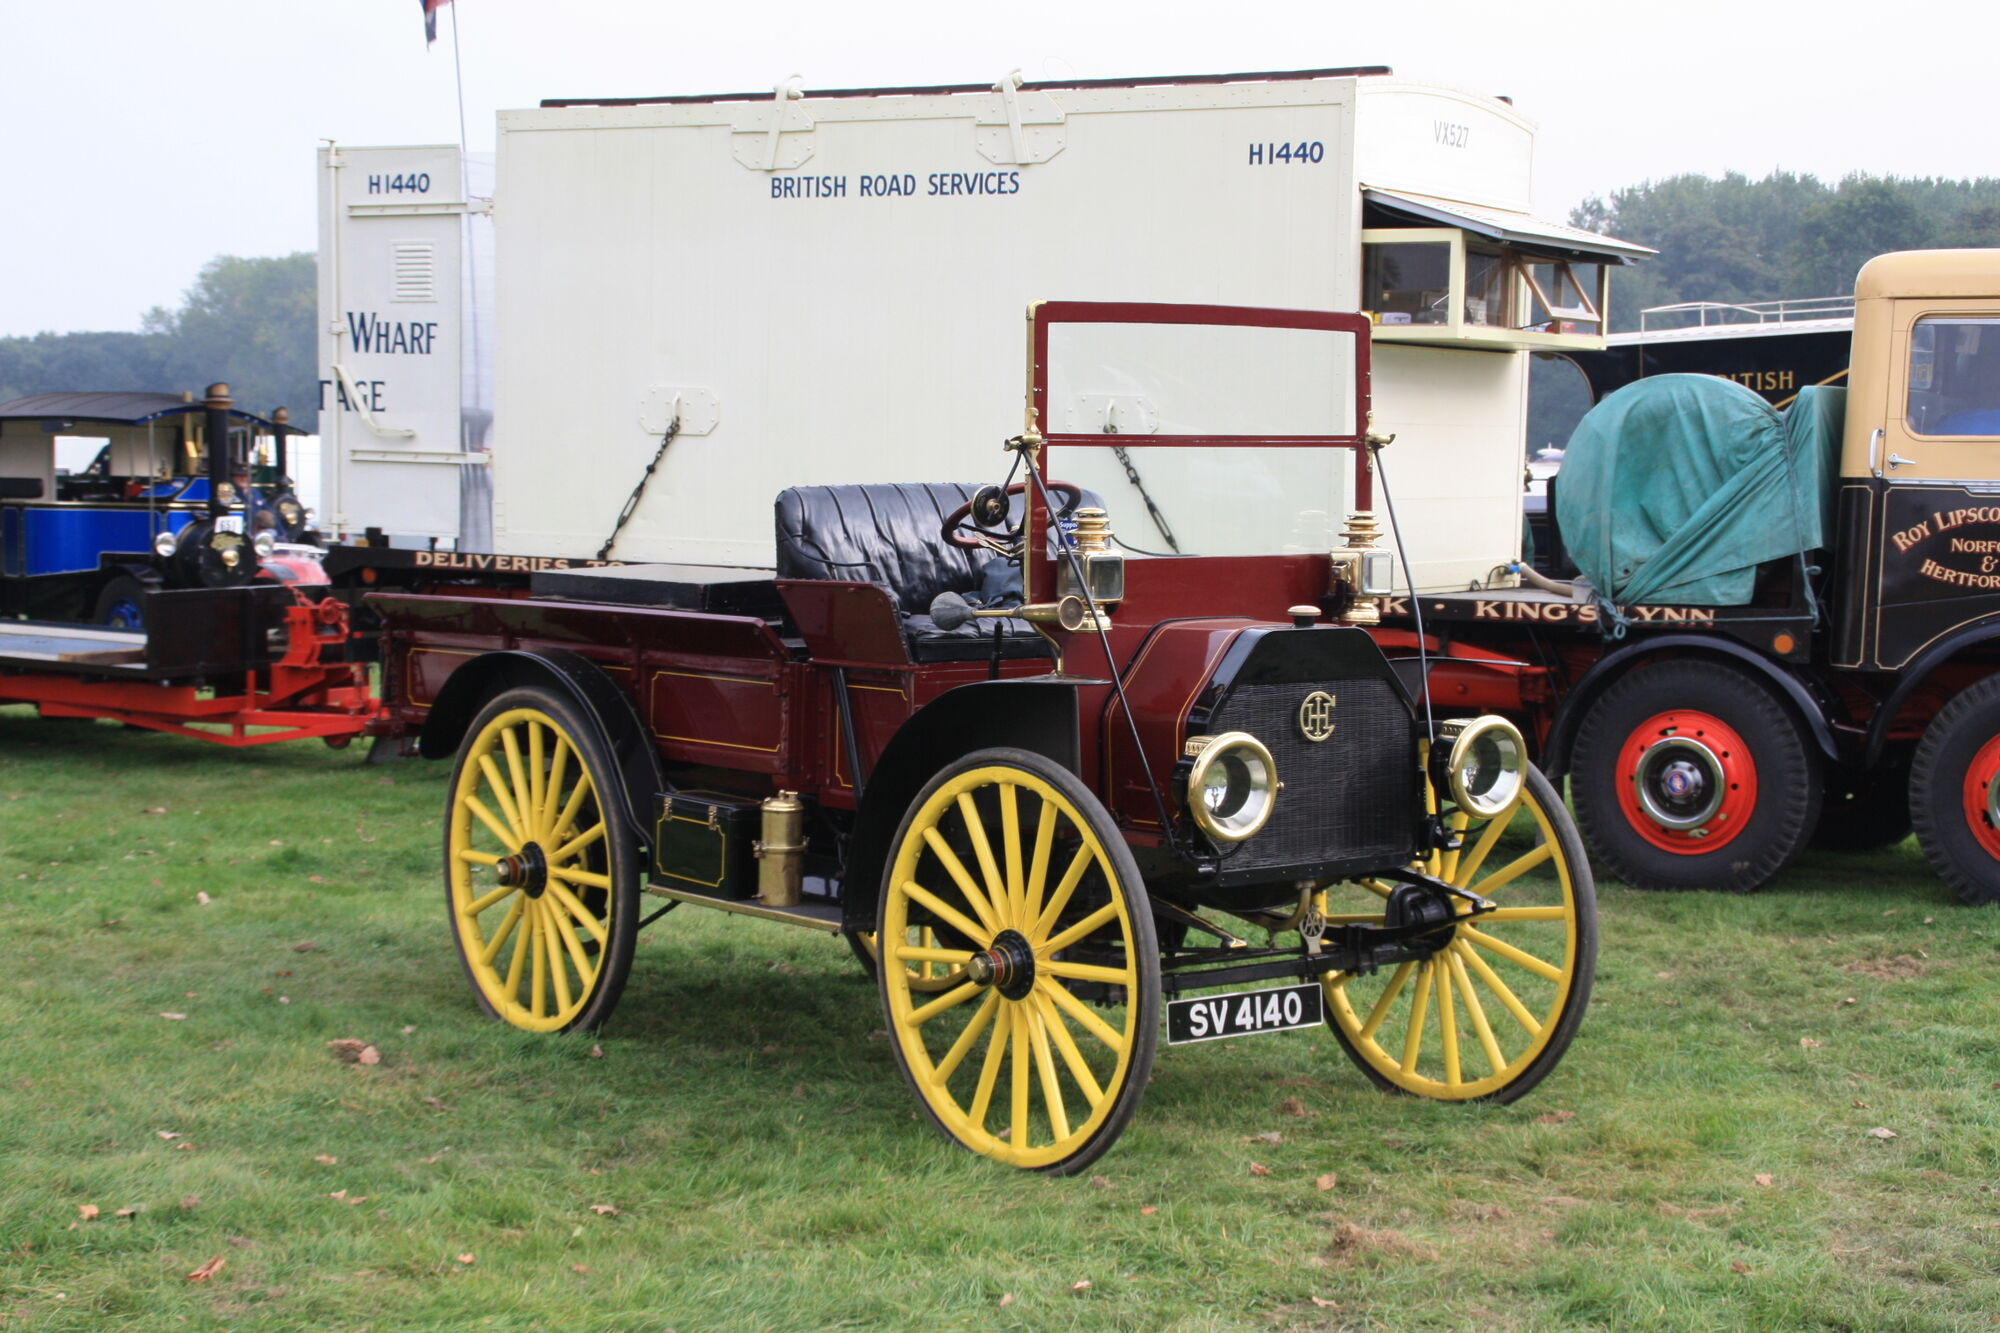 2000?cb=20100601095720 international trucks tractor & construction plant wiki fandom  at n-0.co